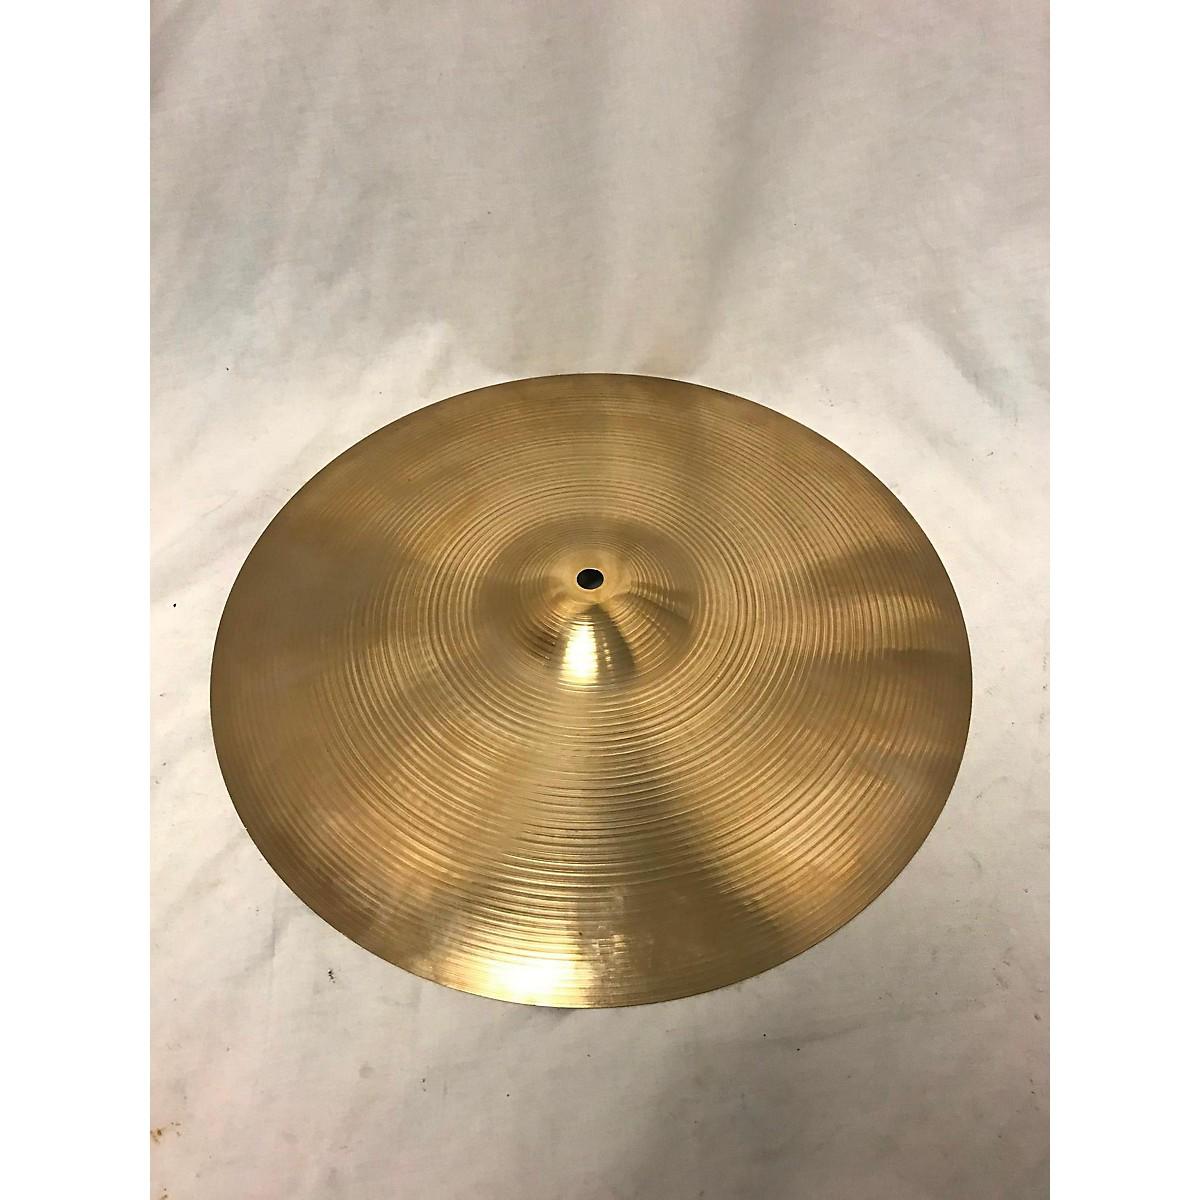 Zildjian 15in A Series Medium Thin Crash Cymbal